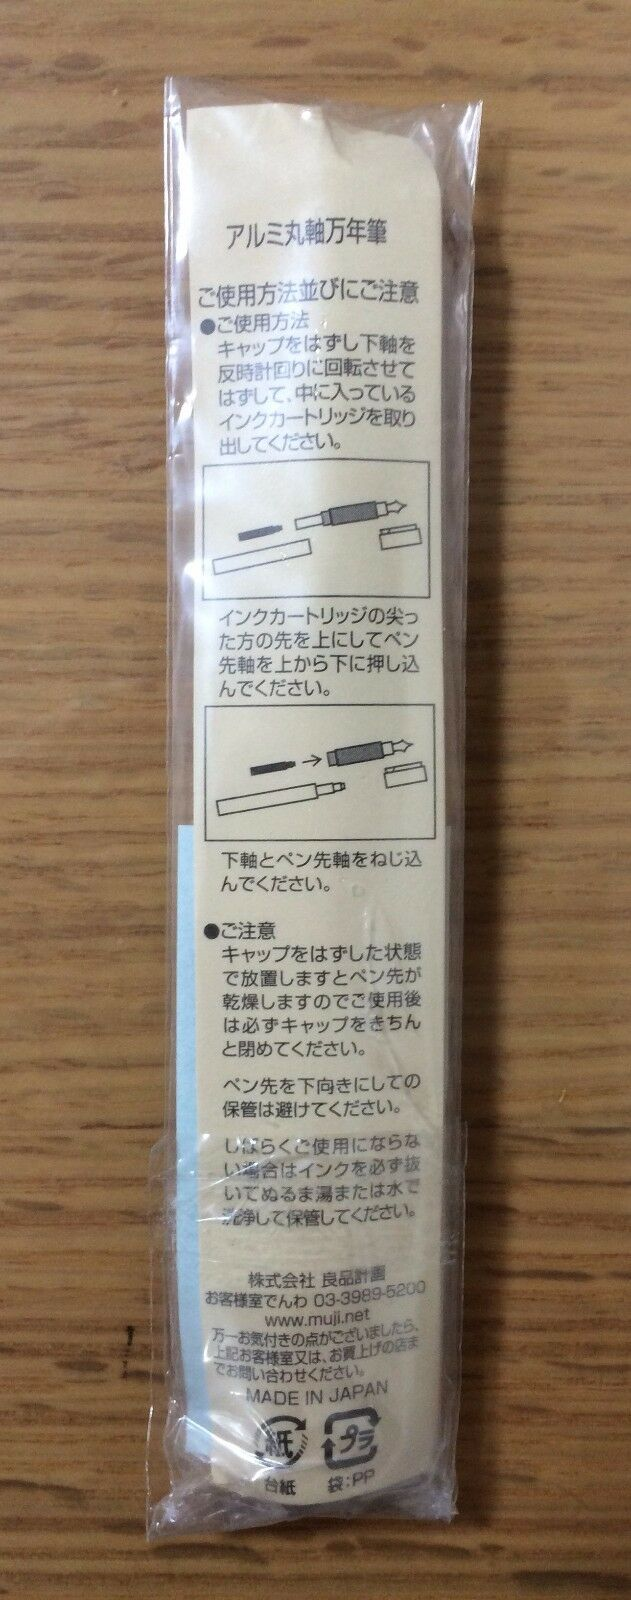 MOMA MUJI Aluminum round Fountain Pen made in Japan fine nib free shipping